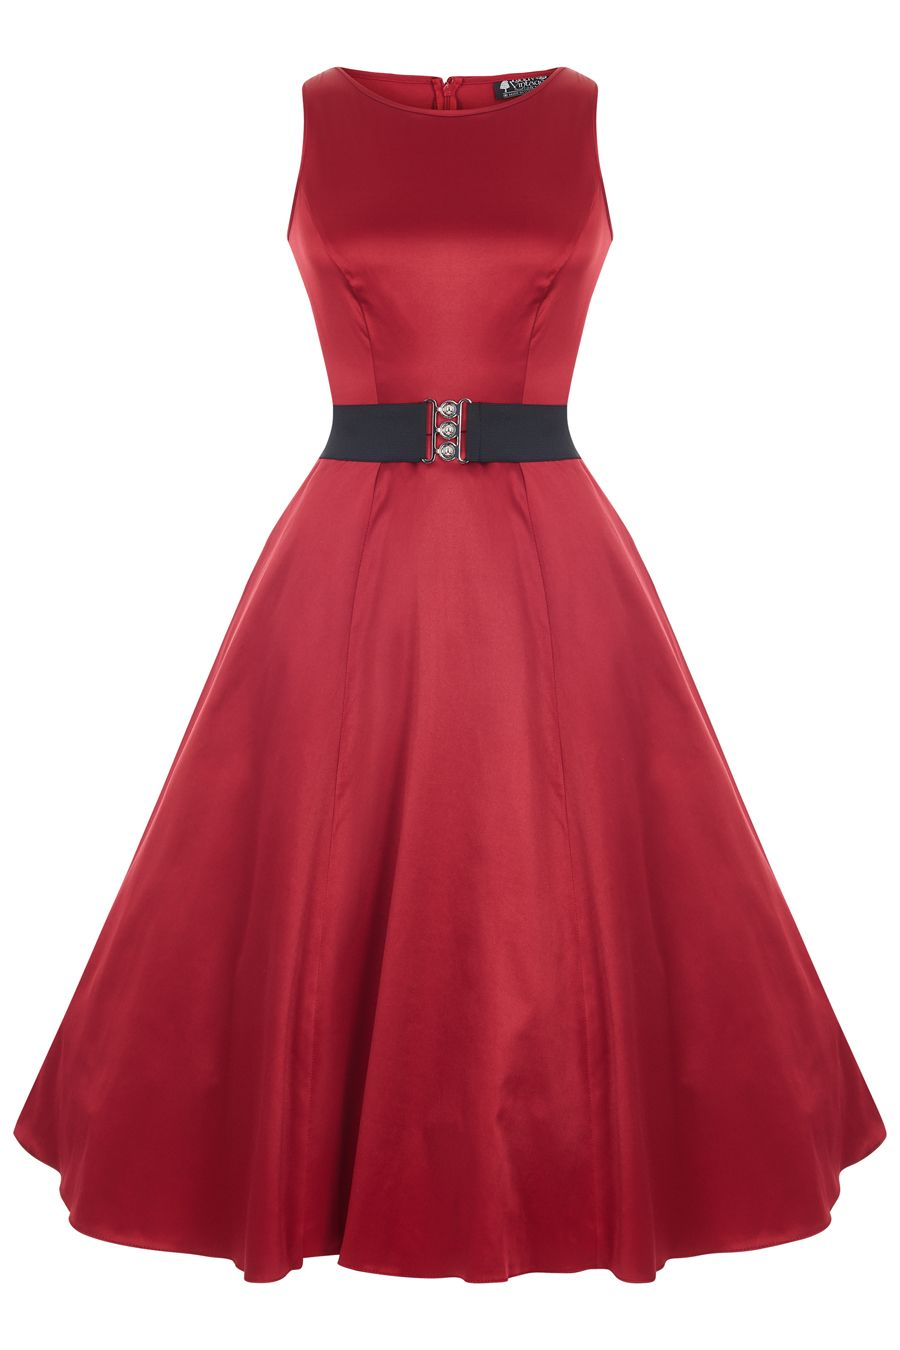 Ruby Red Satin Hepburn Dress with Black Elastic Belt | Vestiditos